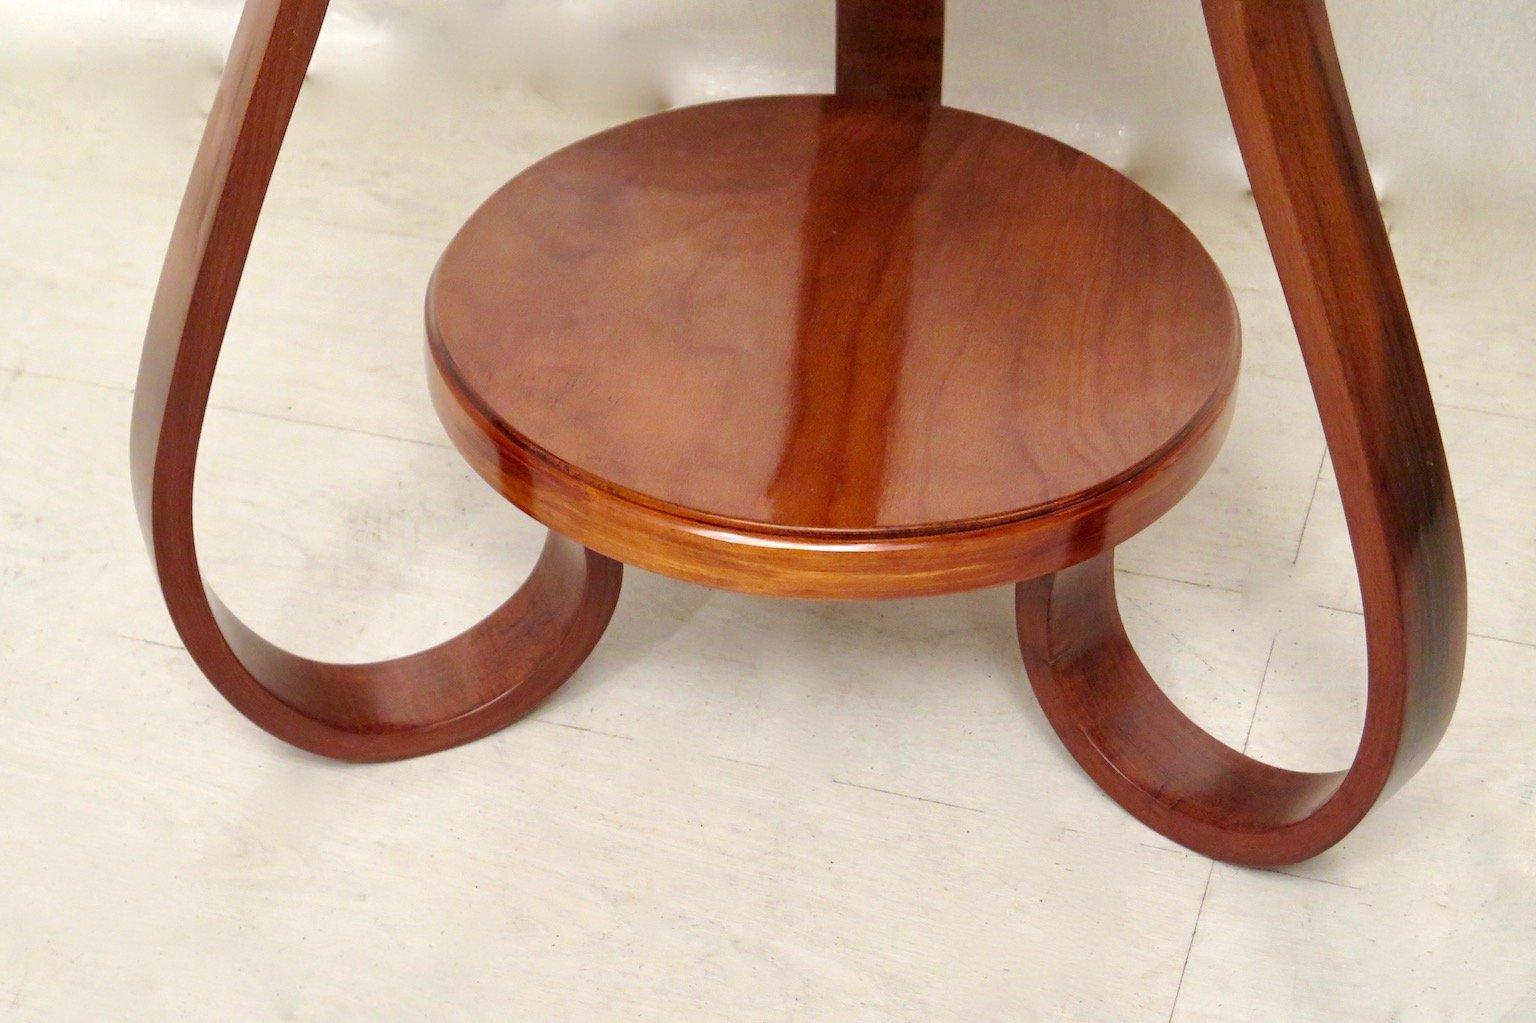 Italian Round Cherrywood Side Table 1930s 6 1 522 00 Price Per Piece